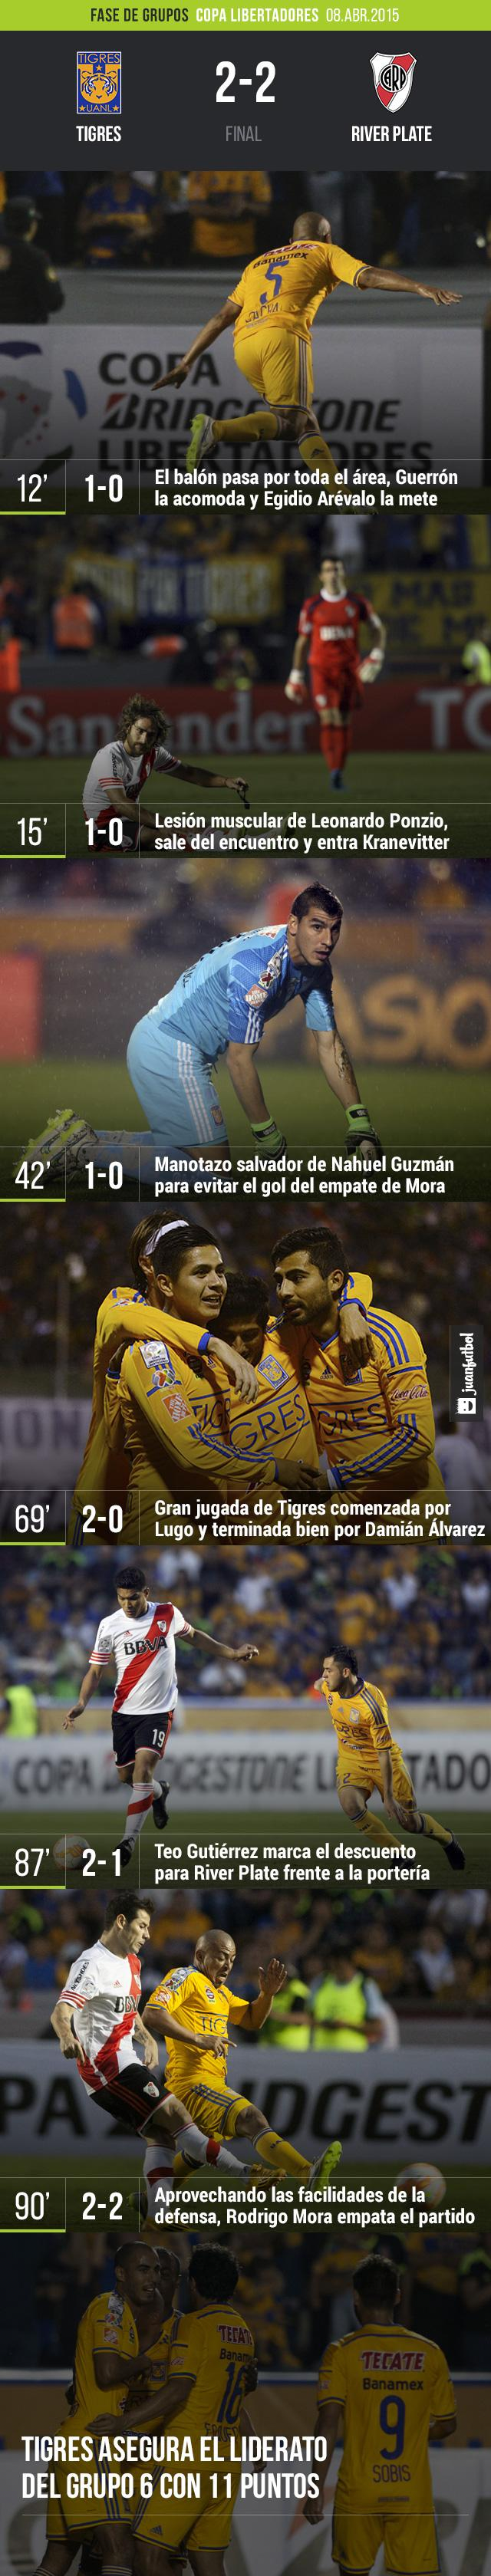 Tigres 2-2 River Plate